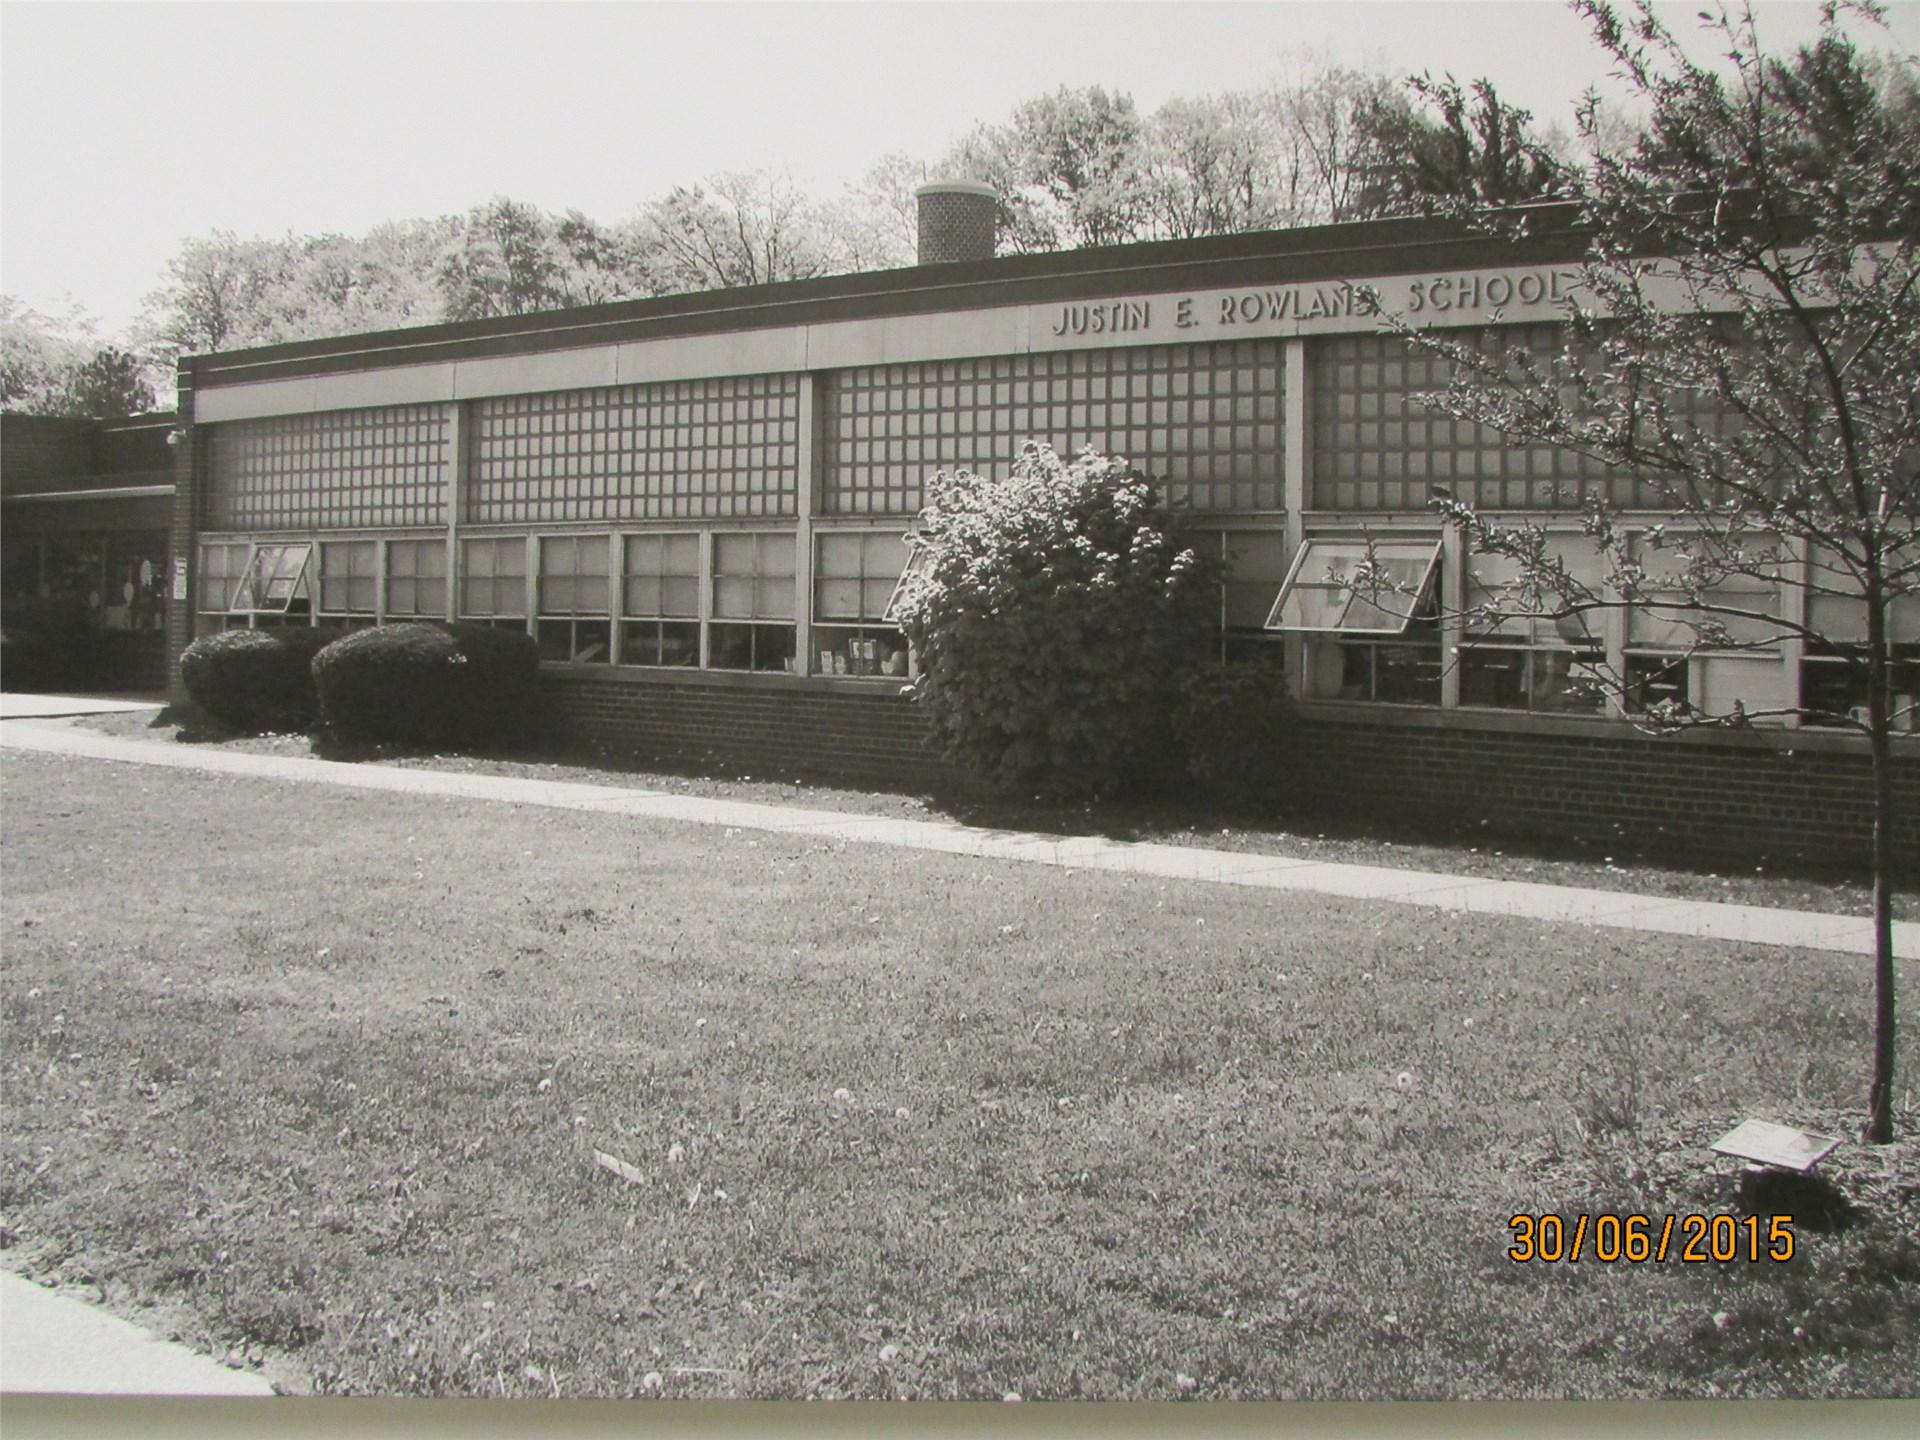 Rowland Elementary School